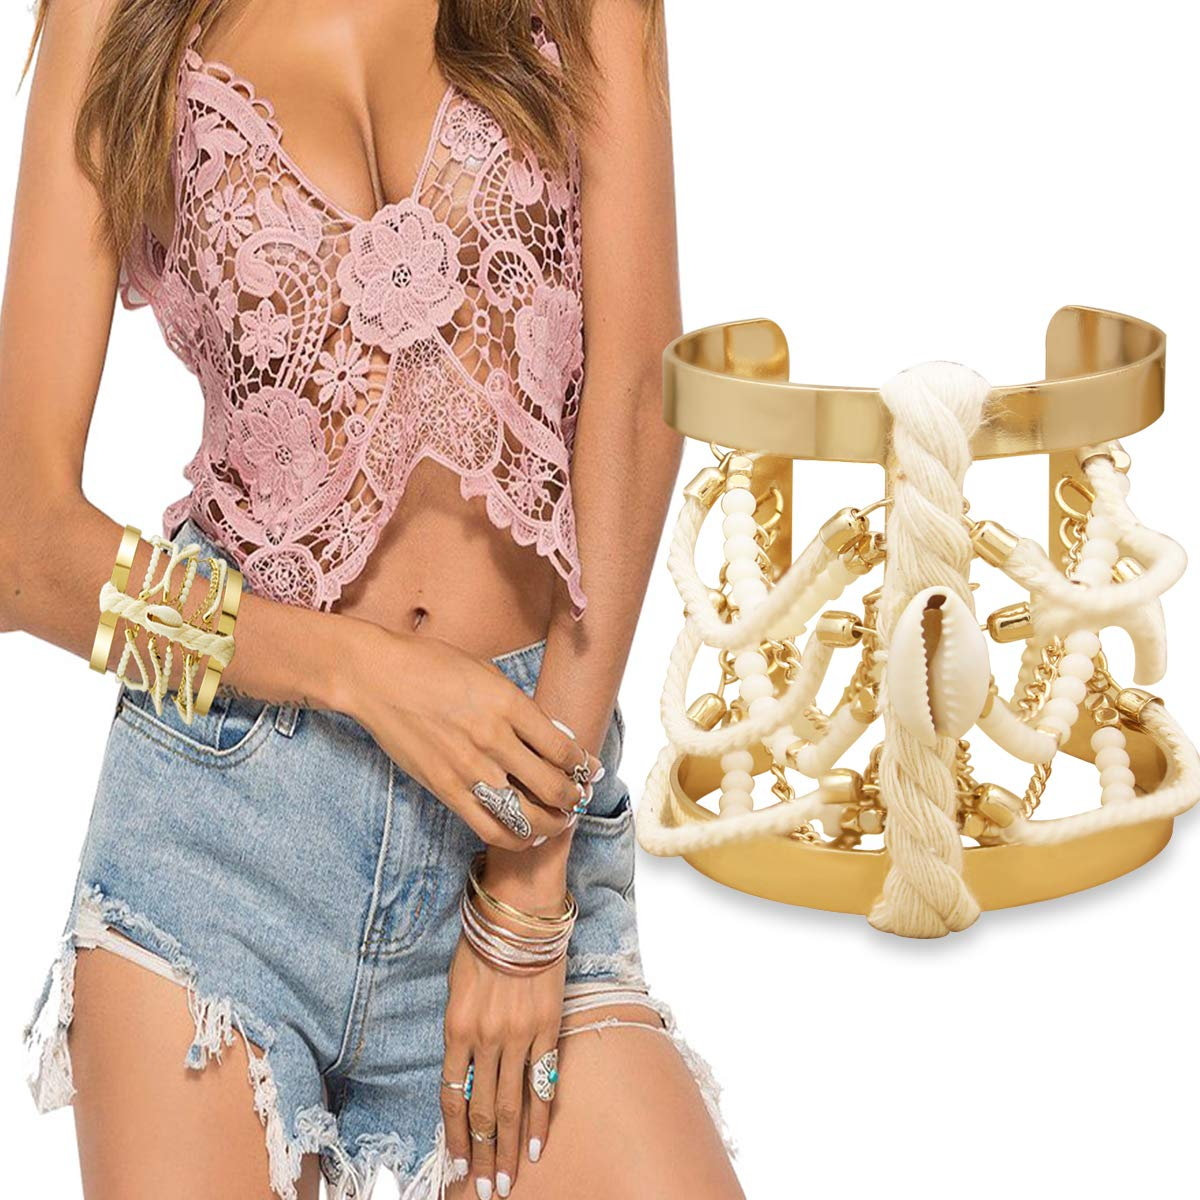 RechicGu Beach Shell Beaded Wide Braided Gold Metal Bracelet Bangle Cuff Gypsy Statement Gift